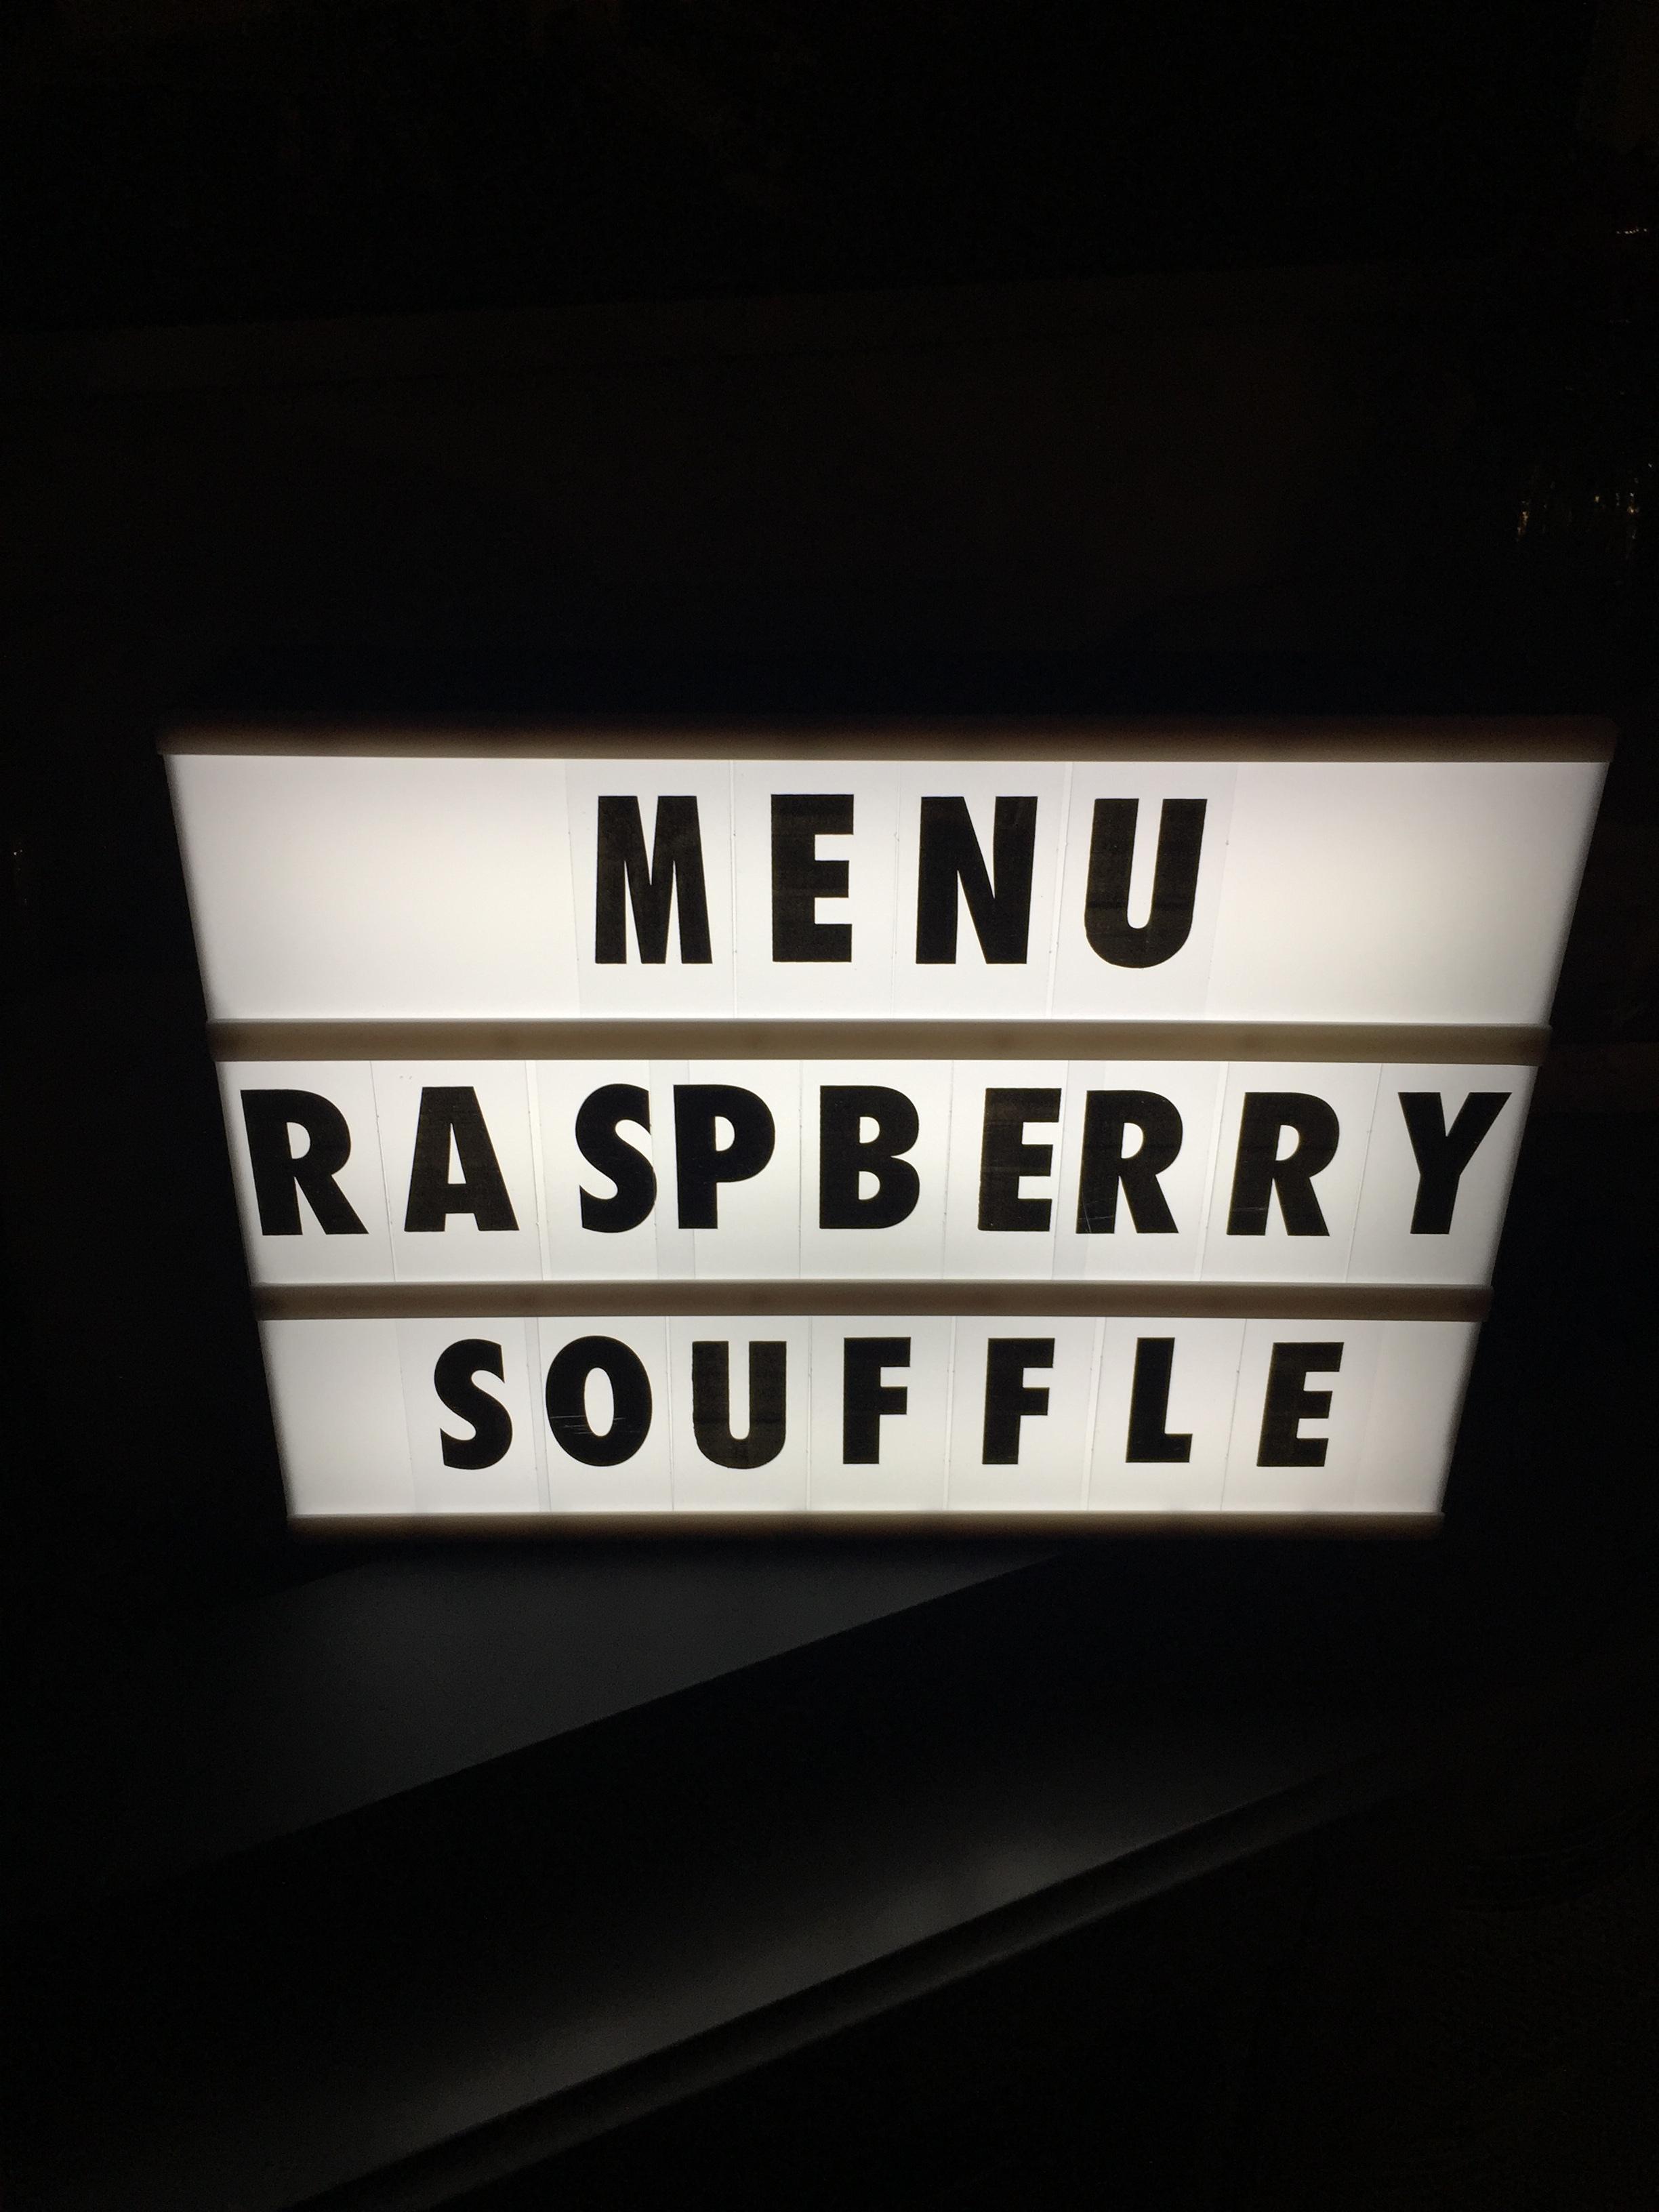 36RaspberrySouffle1.JPG